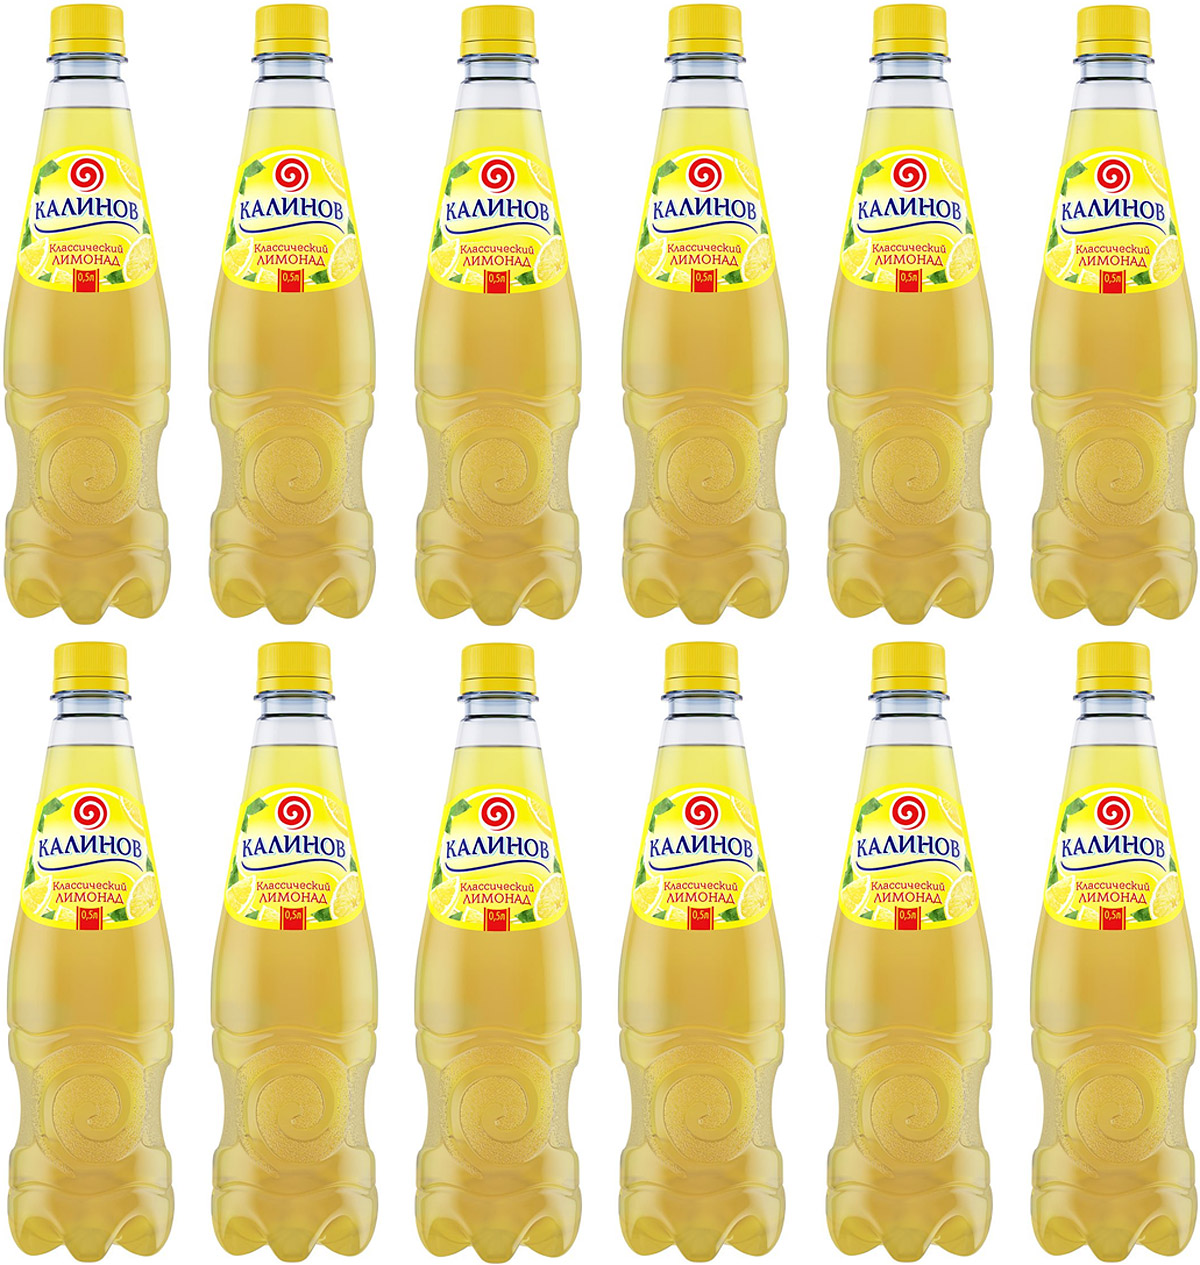 Калинов Лимонад классический, 12 шт по 0,5 л калинов лимонад буратино 12 шт по 0 5 л